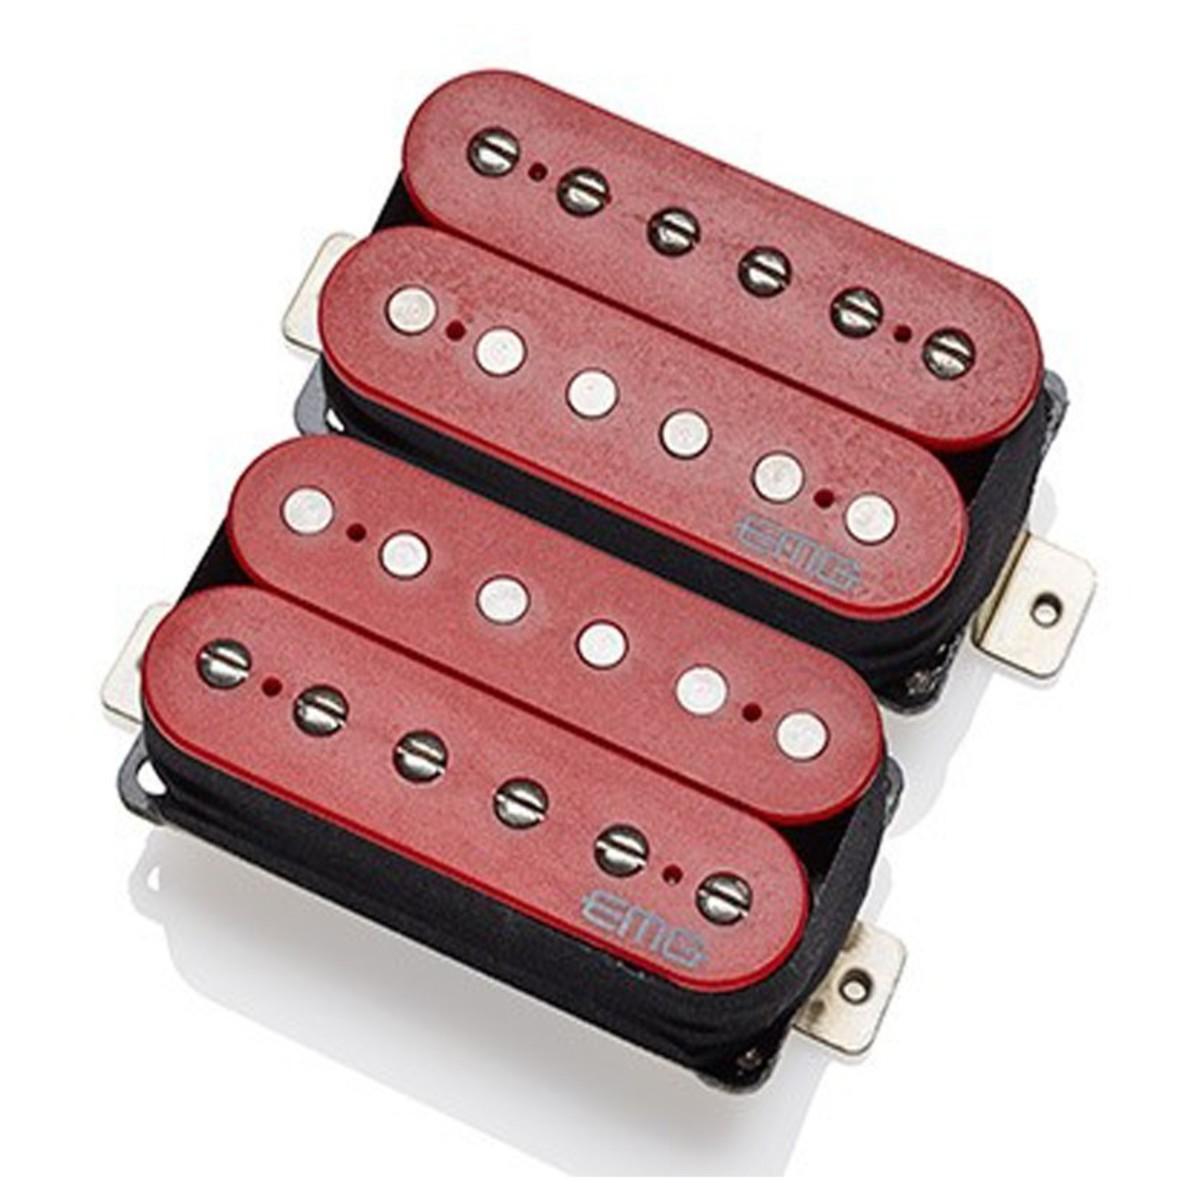 EMG Fat 55 Floyd Pickup Set, Red